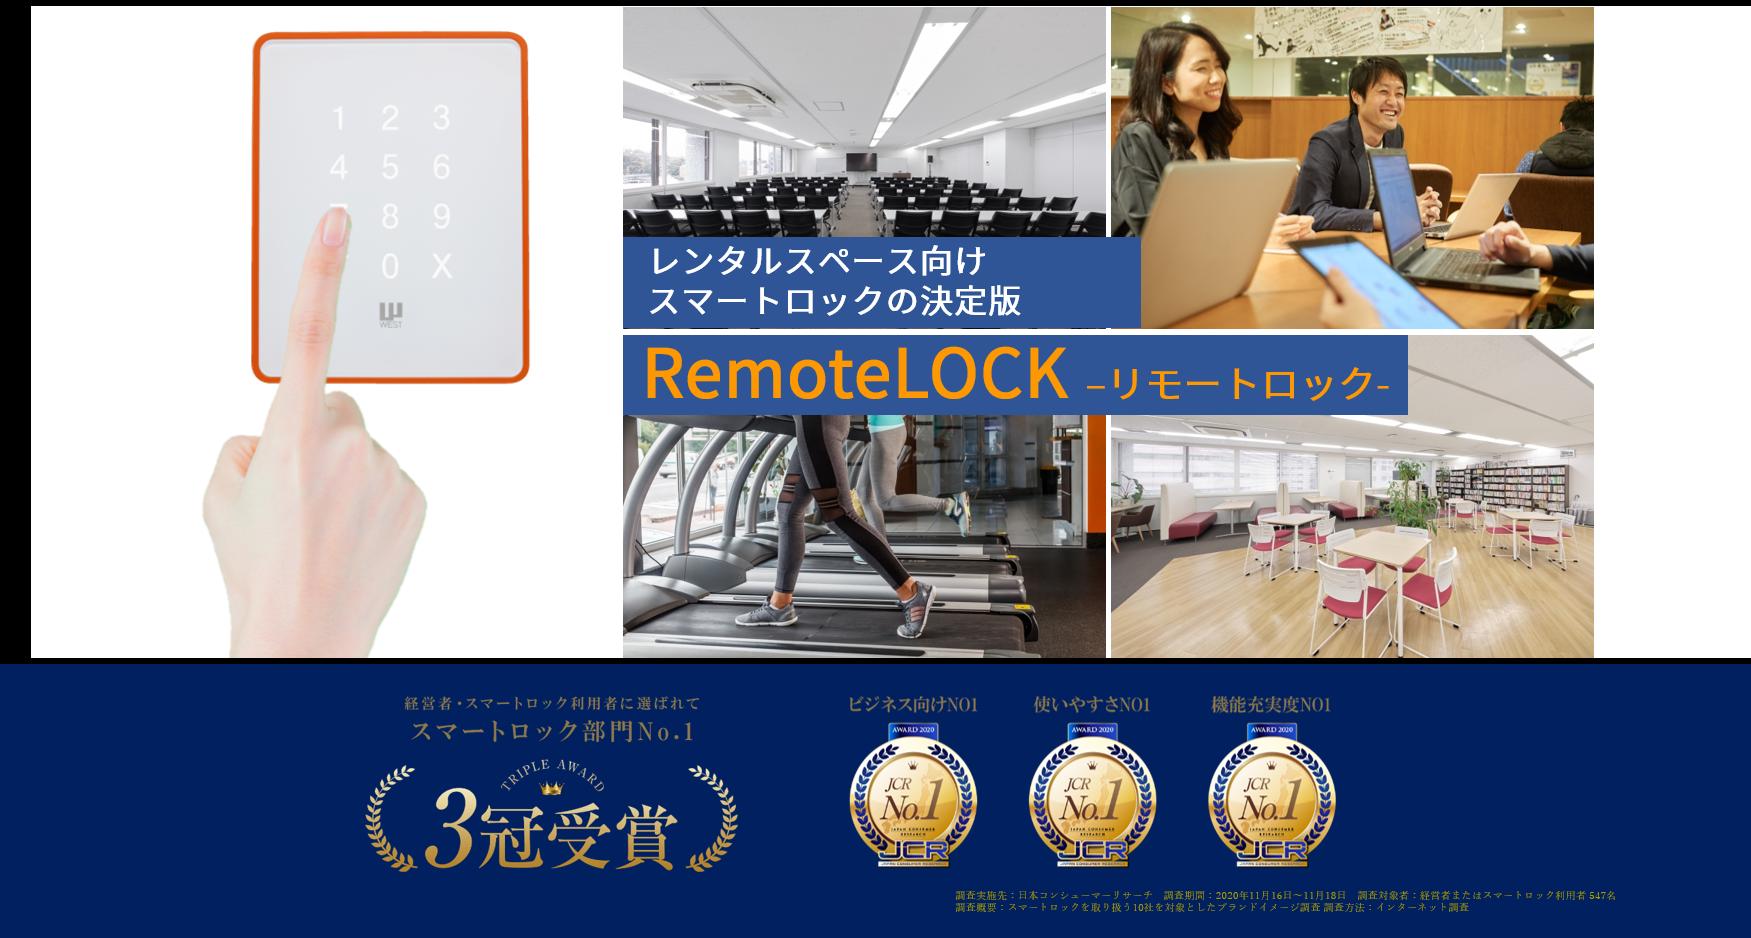 Ori_rental-space-remotelock-first